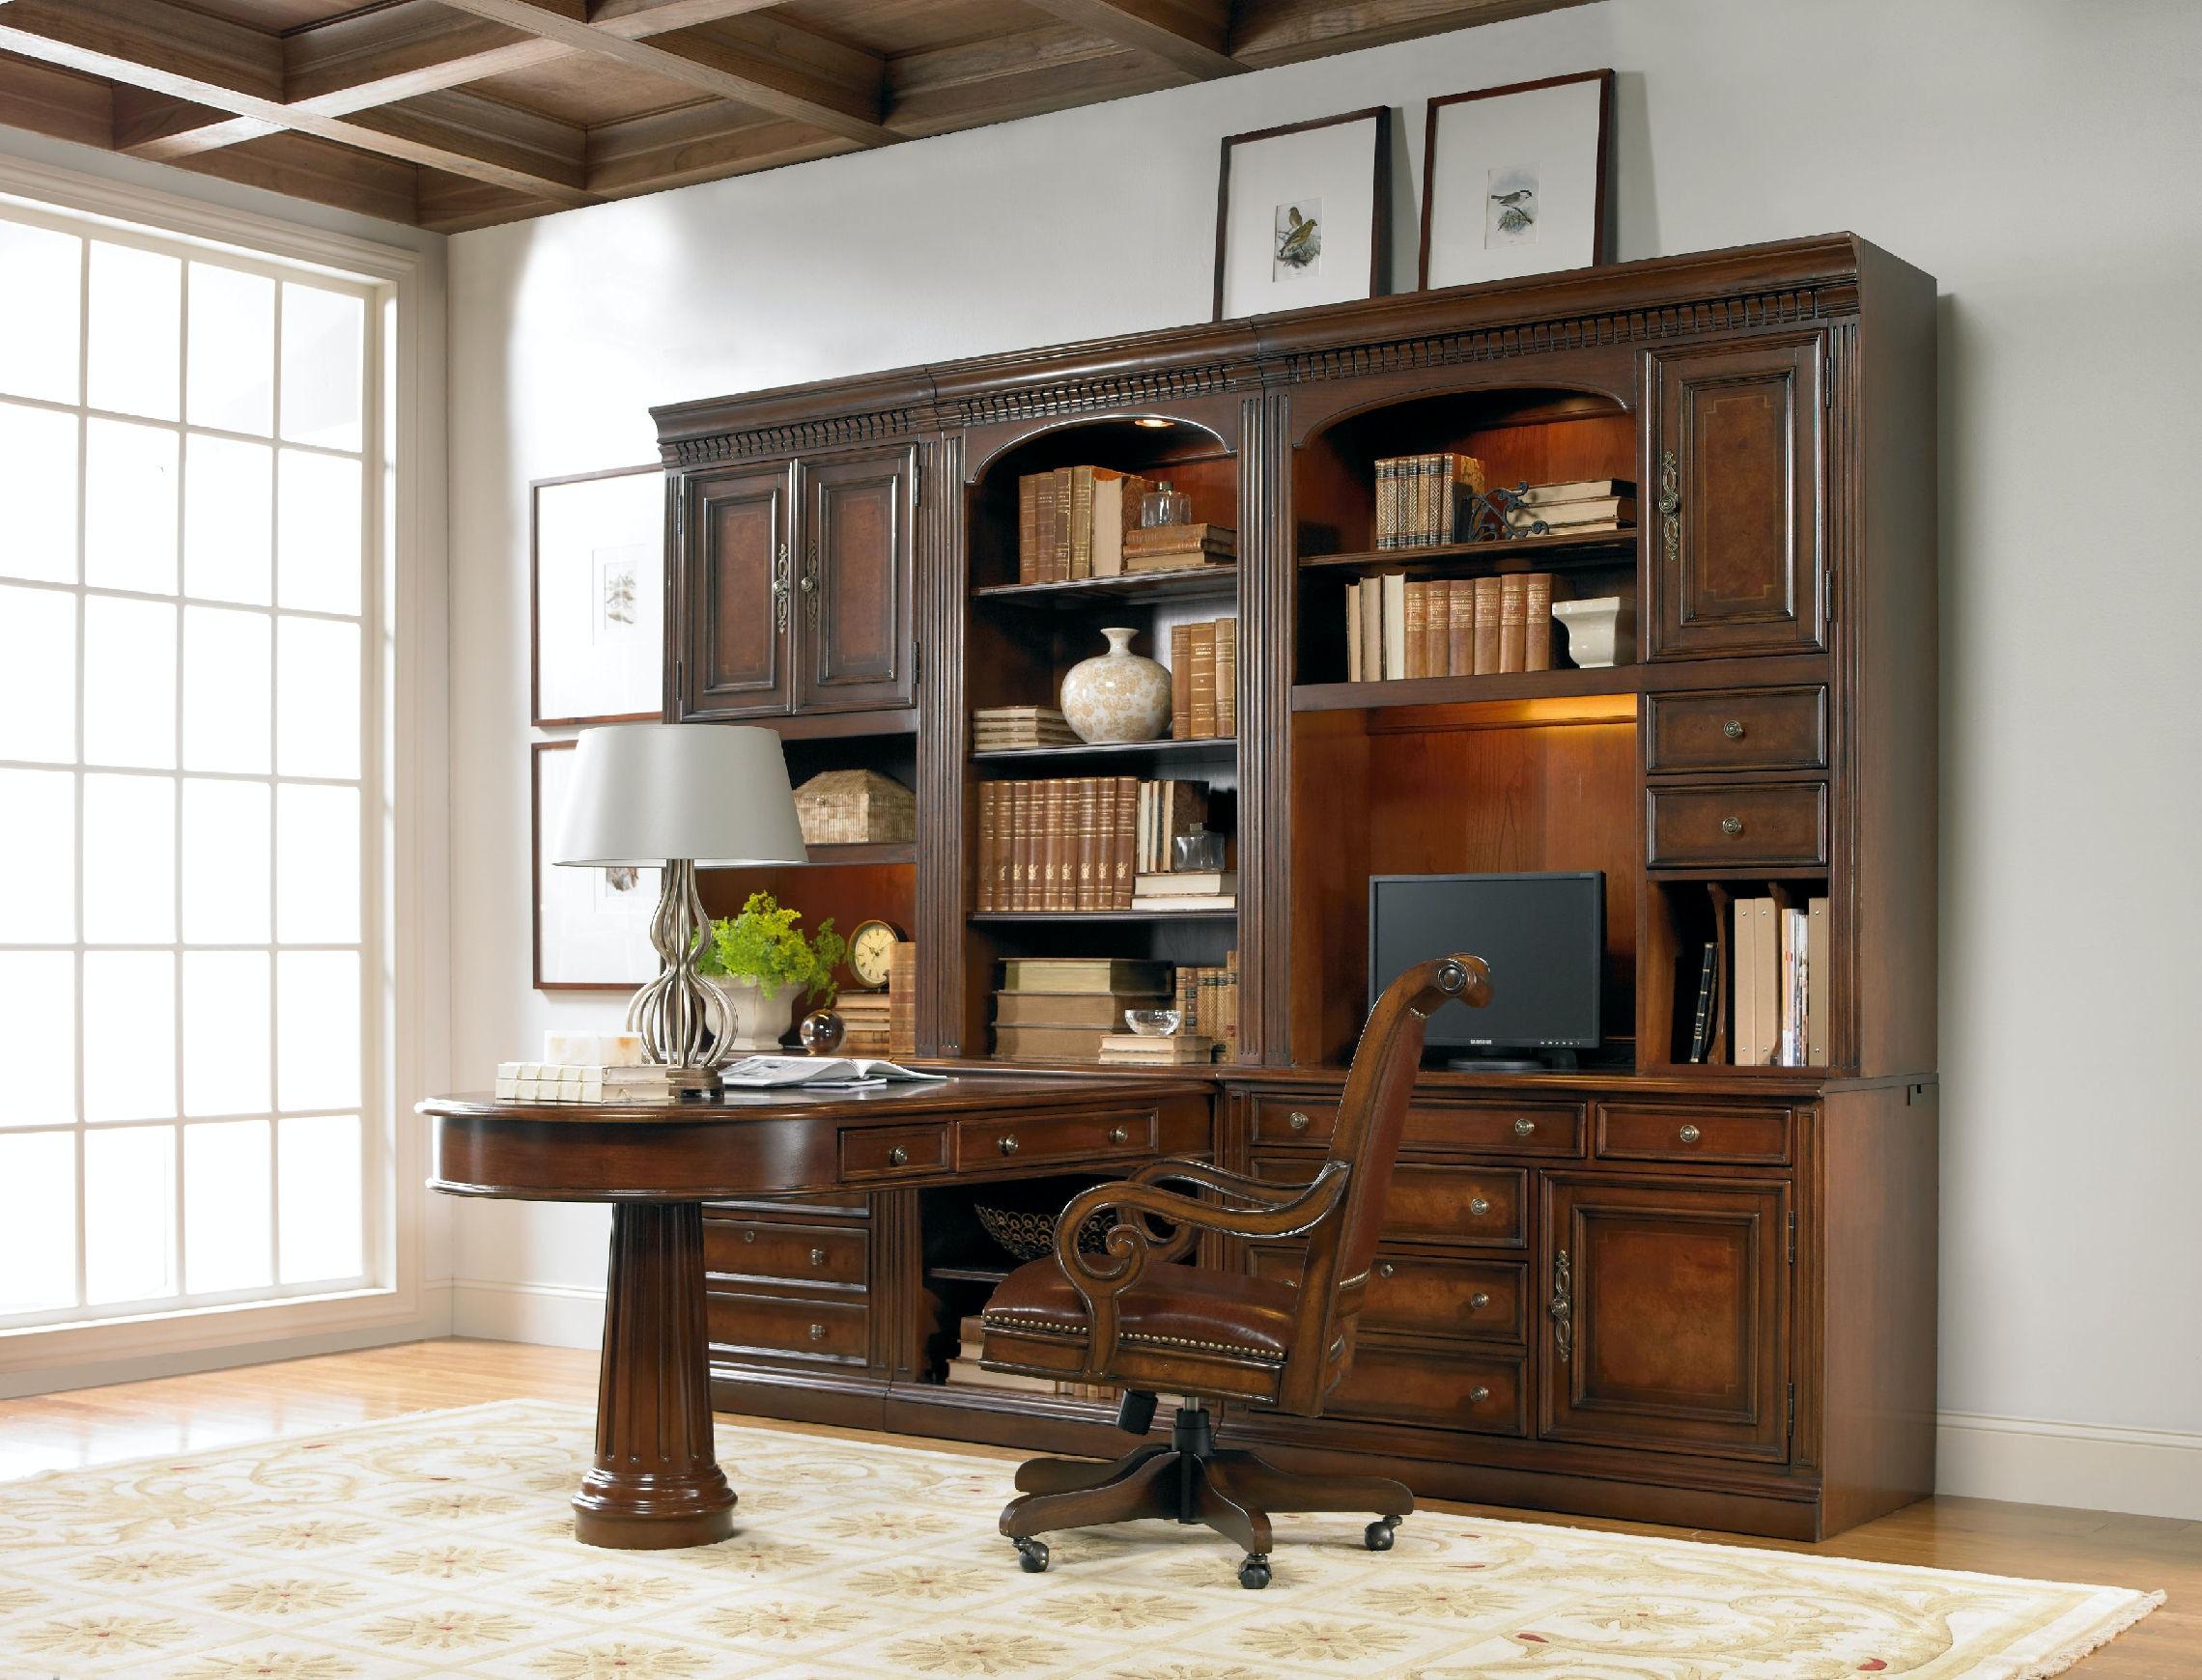 Etonnant Hooker Furniture European Renaissance II Peninsula Desk Complete 374 10 424